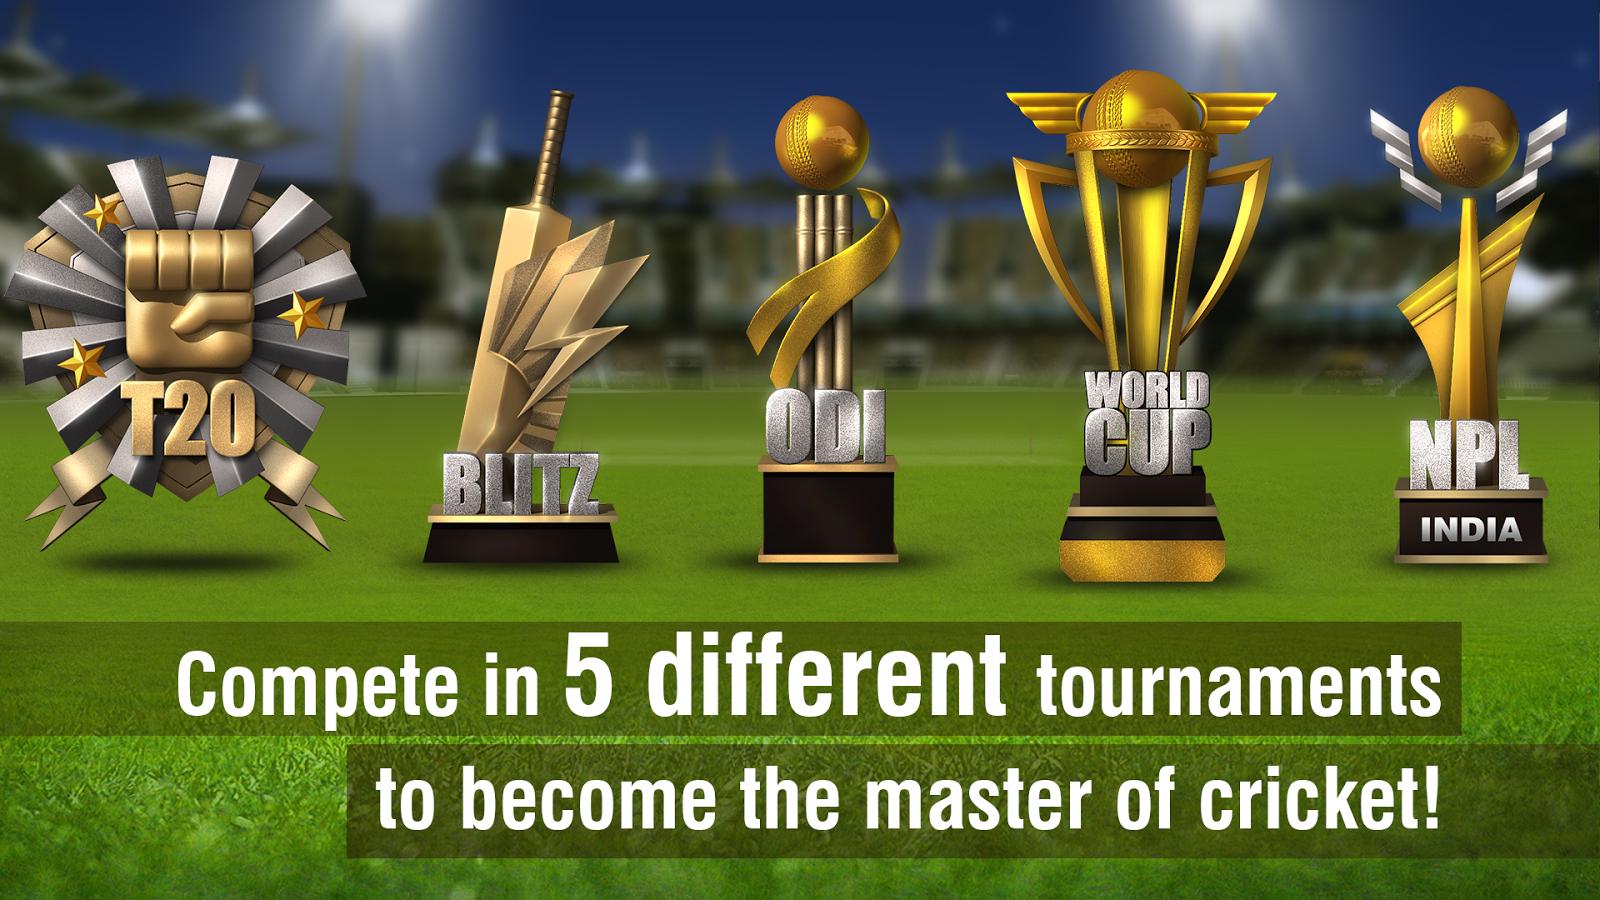 World cricket championship 2 255 apk obb data file download world cricket championship 2 255 screenshot 15 solutioingenieria Choice Image